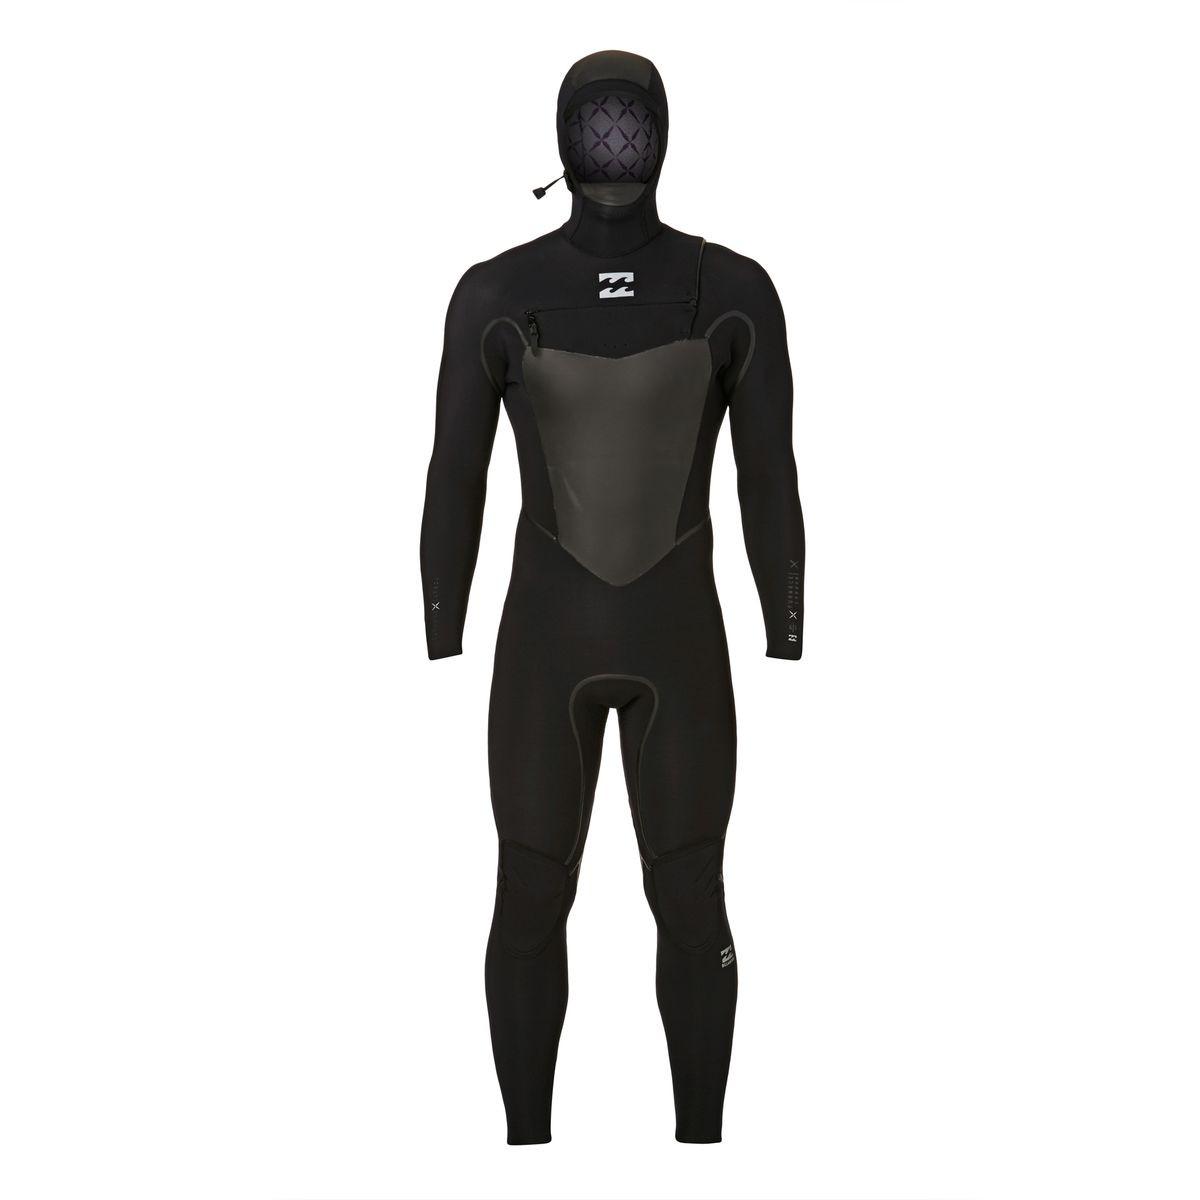 Billabong Furnace Carbon X 6/5mm 2018 Hooded Chest Zip Wetsuit - Black